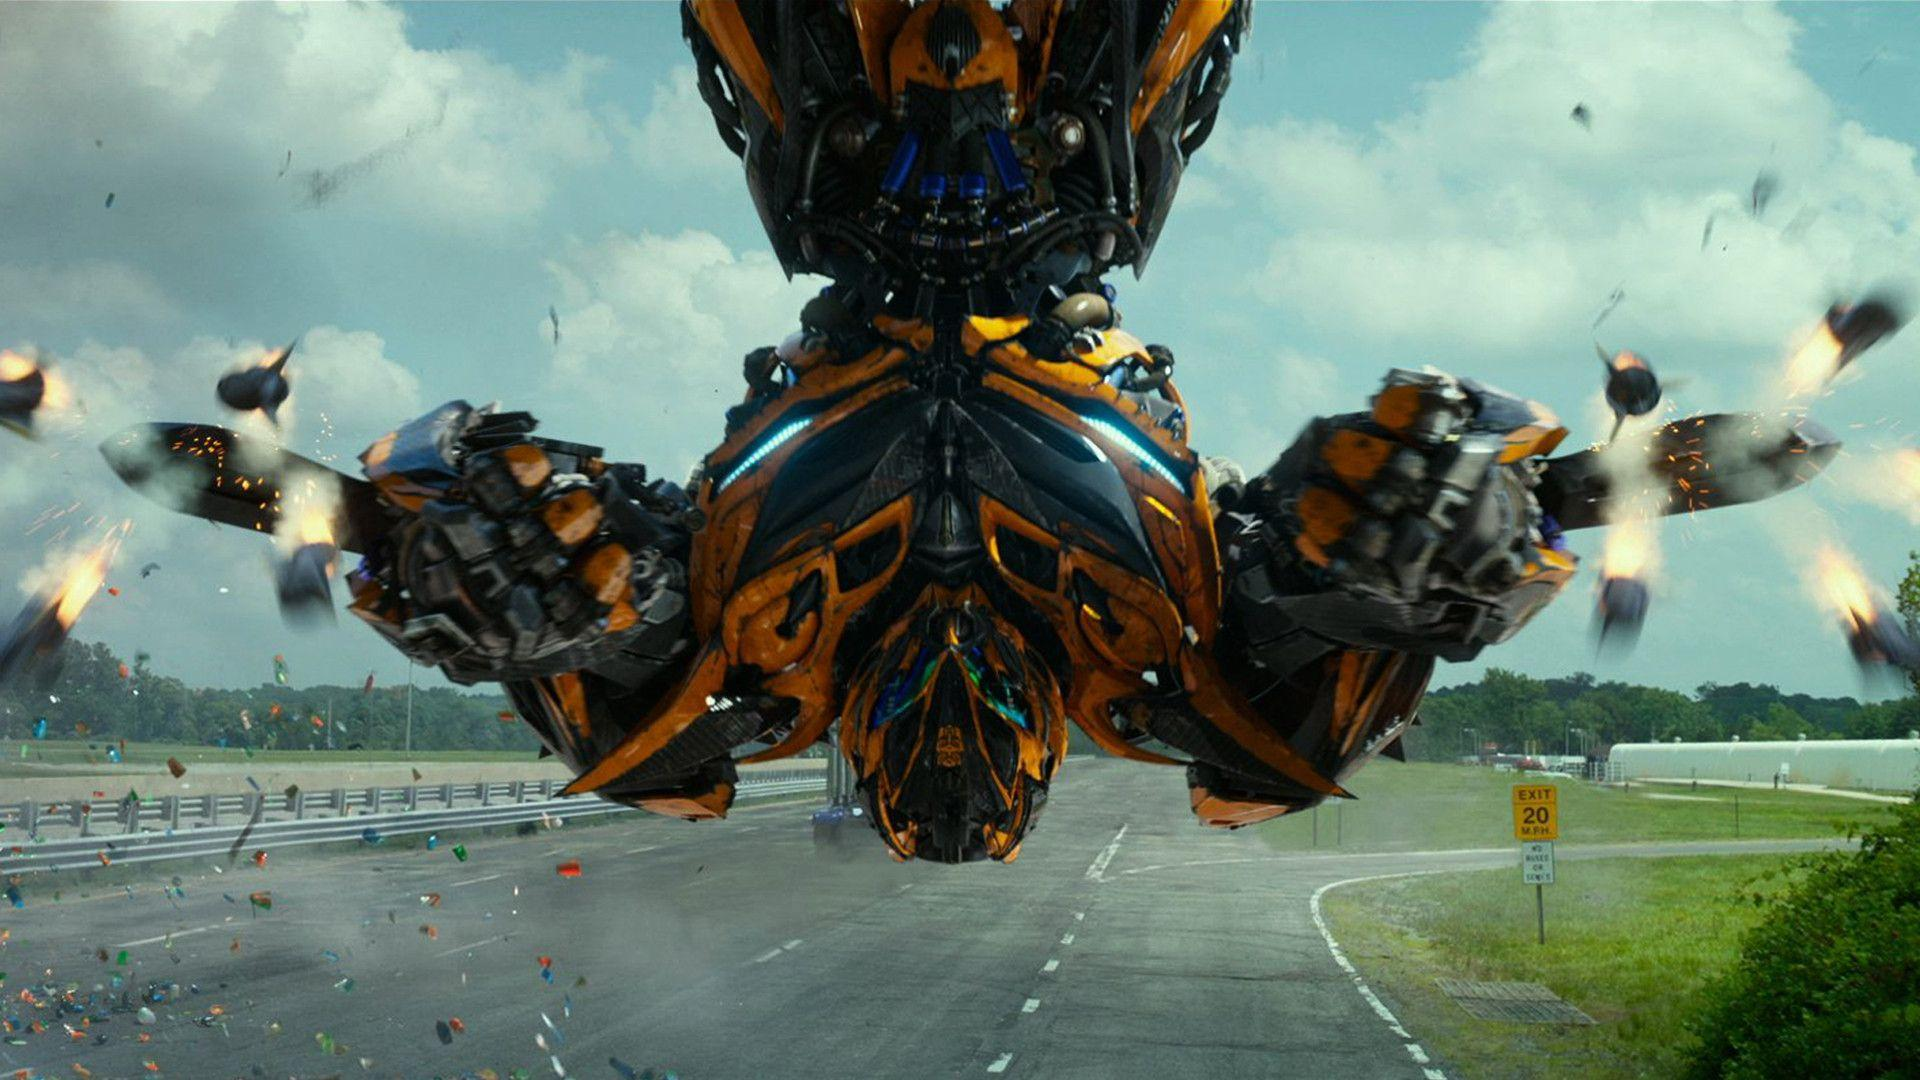 Transformers 4 Bumblebee Wallpapers Wallpaper Cave